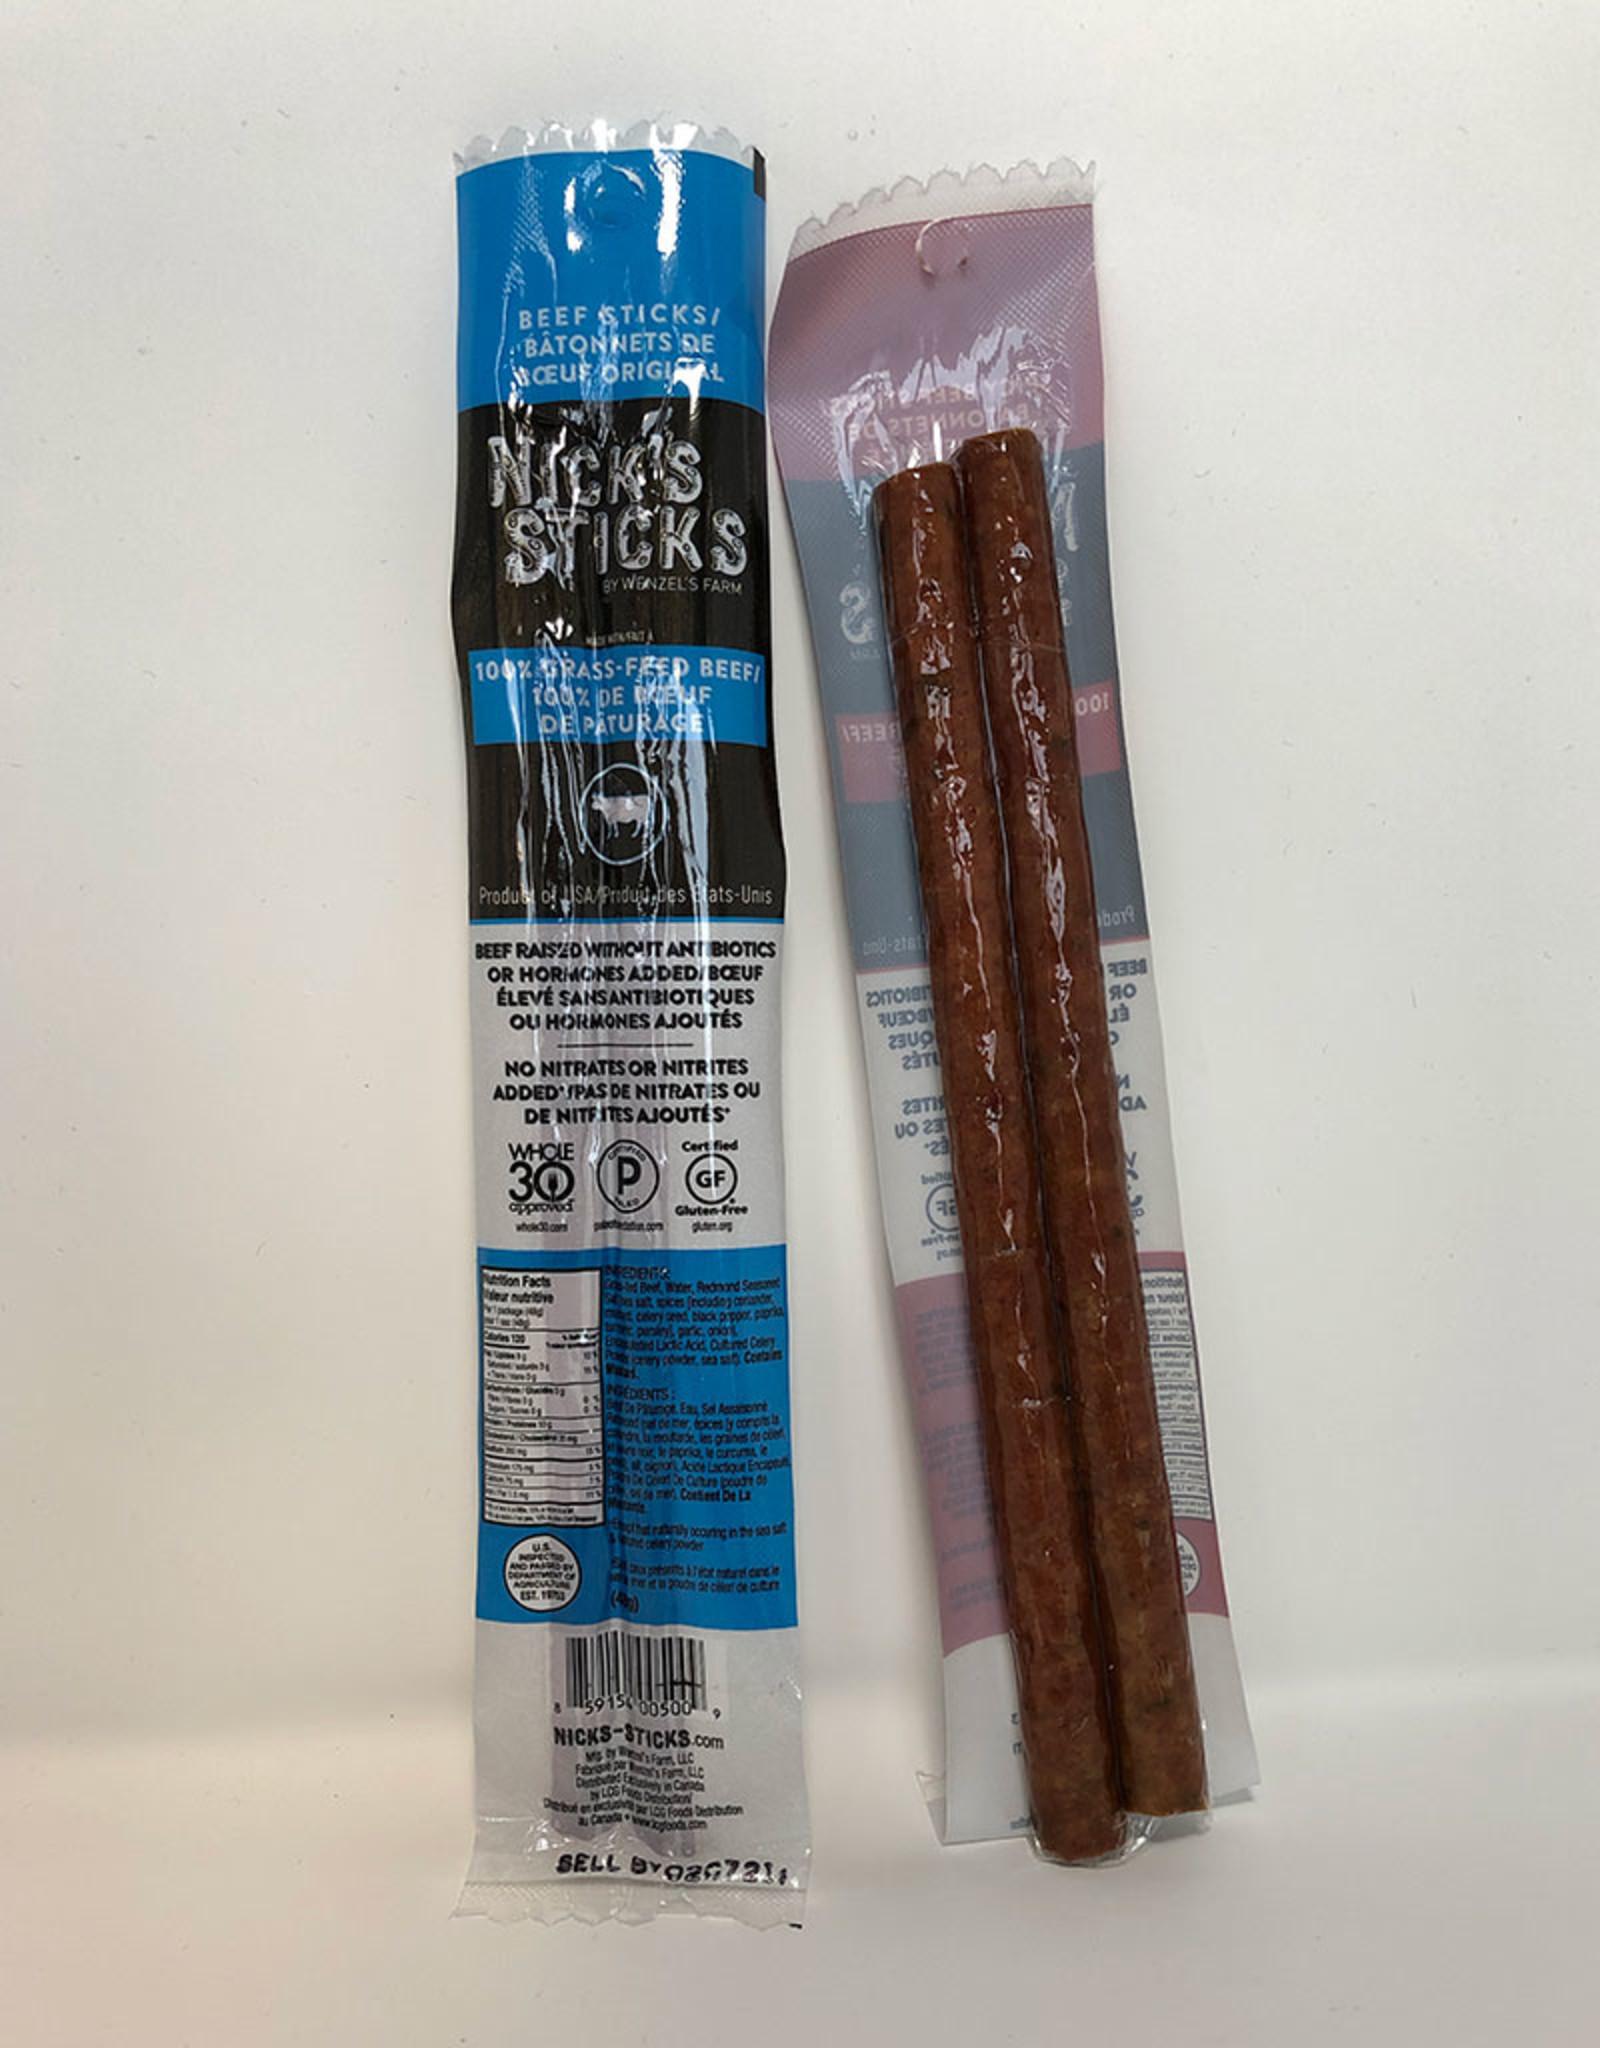 Nick's Sticks Nicks Sticks - Grass Fed Beef Snack Sticks, Original